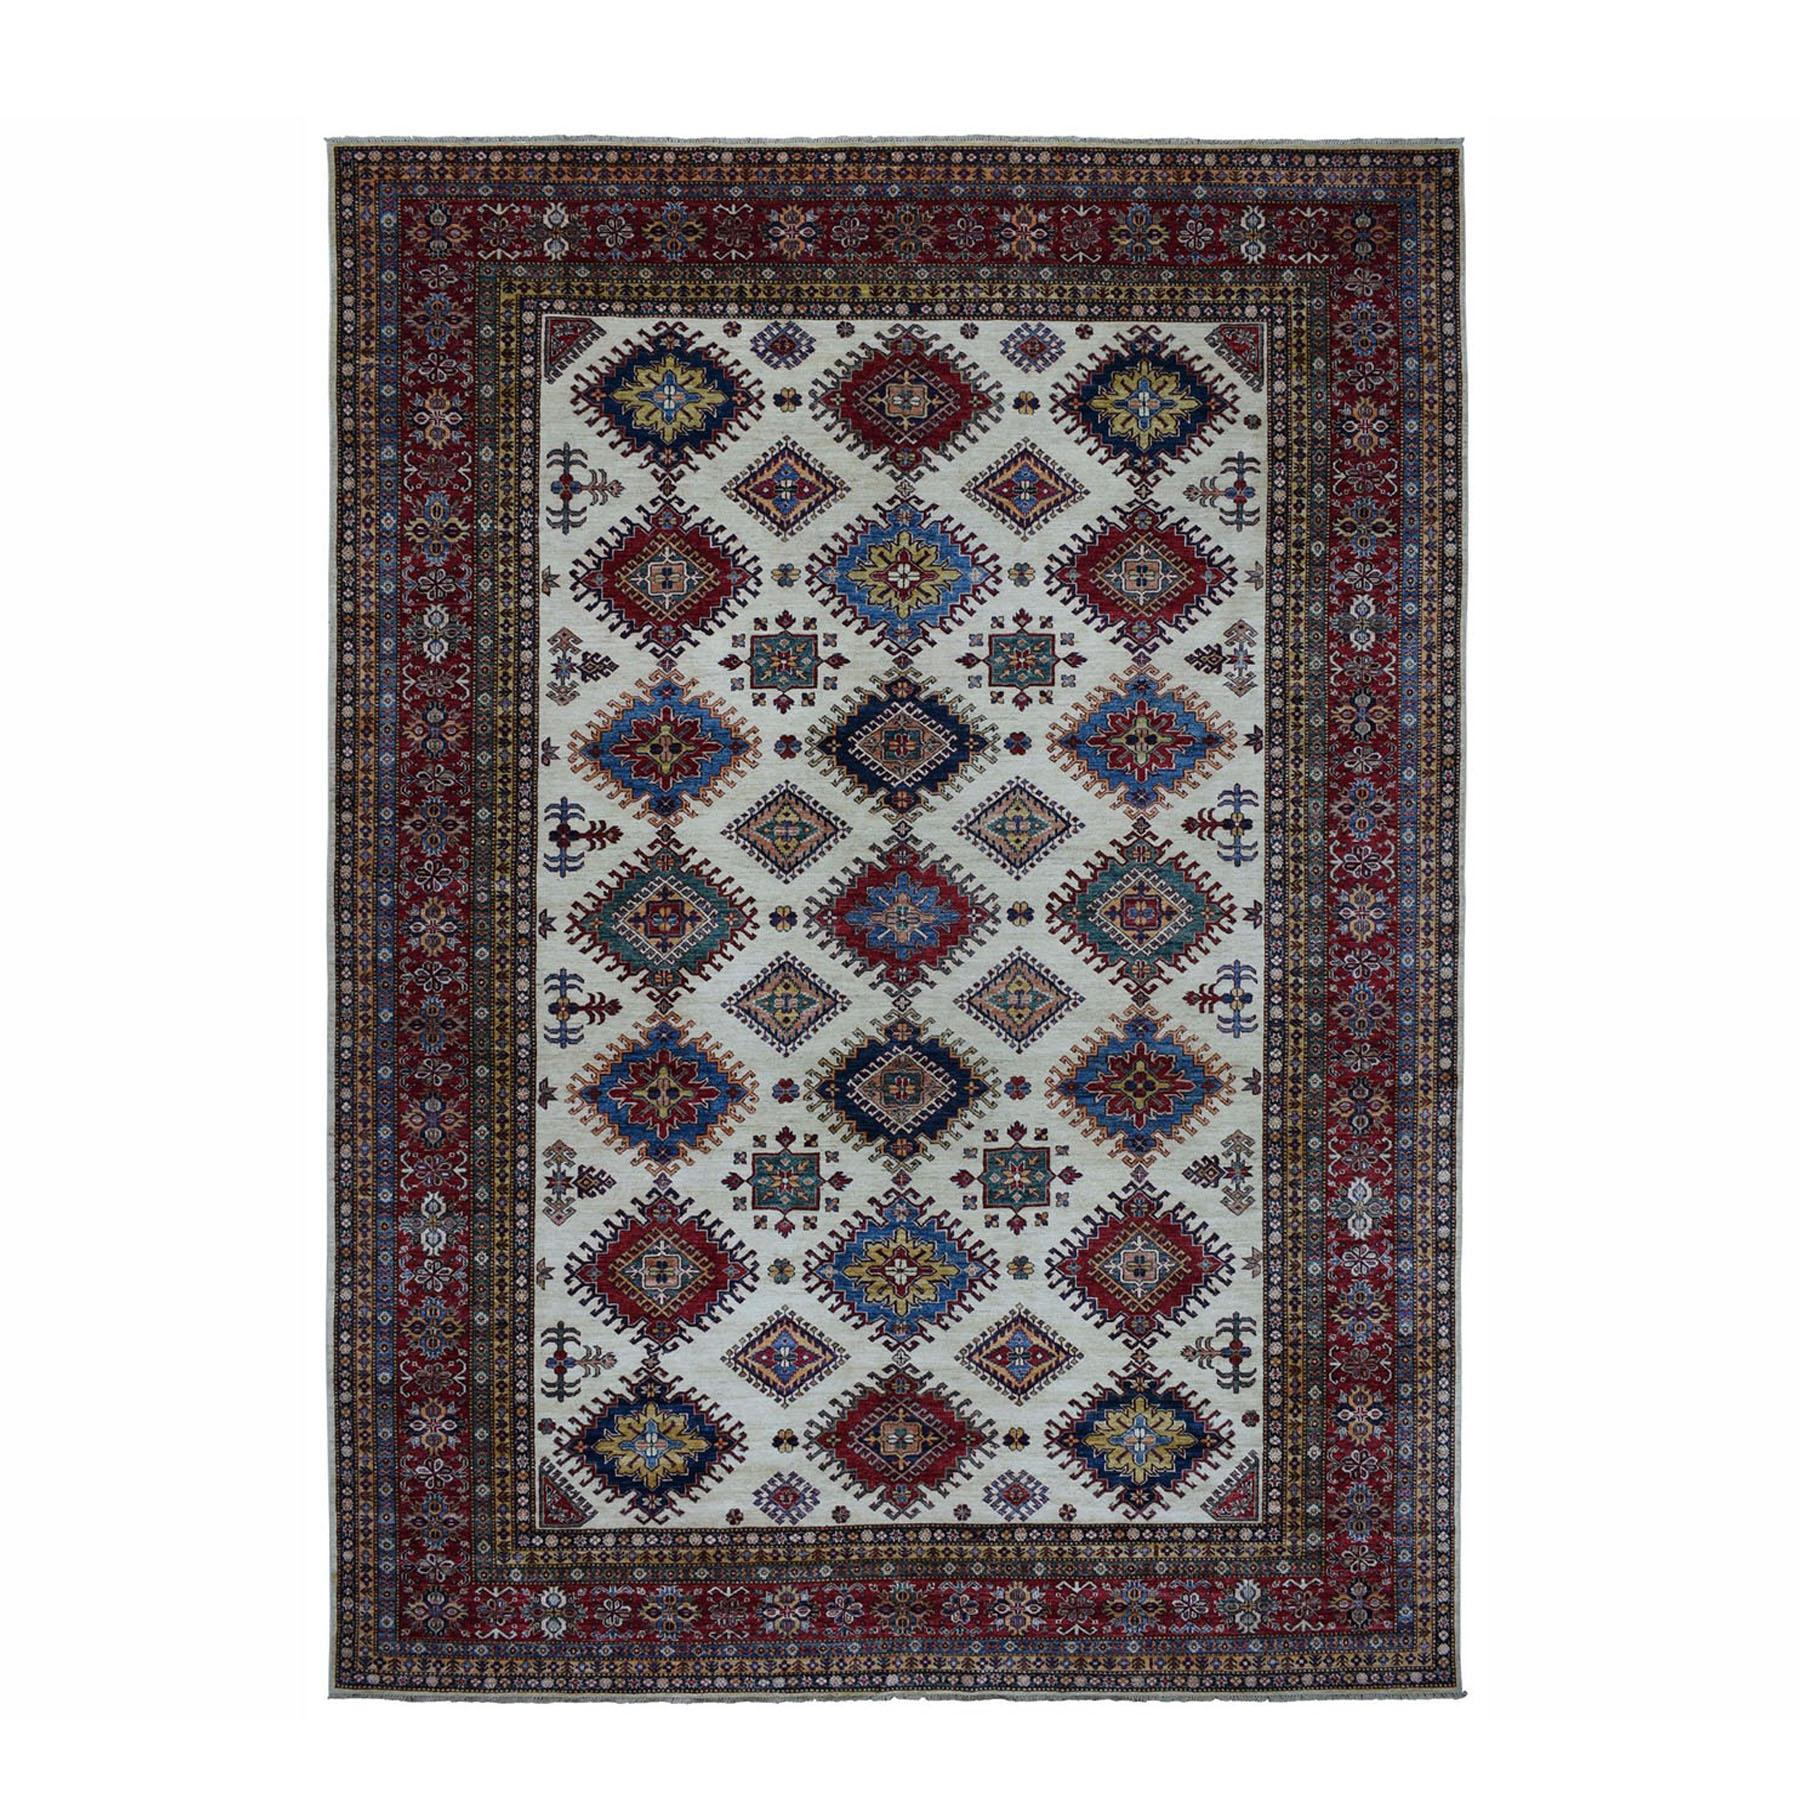 "10'x13'1"" Super Kazak Pure Wool Ivory Geometric Design Hand-Knotted Oriental Rug"